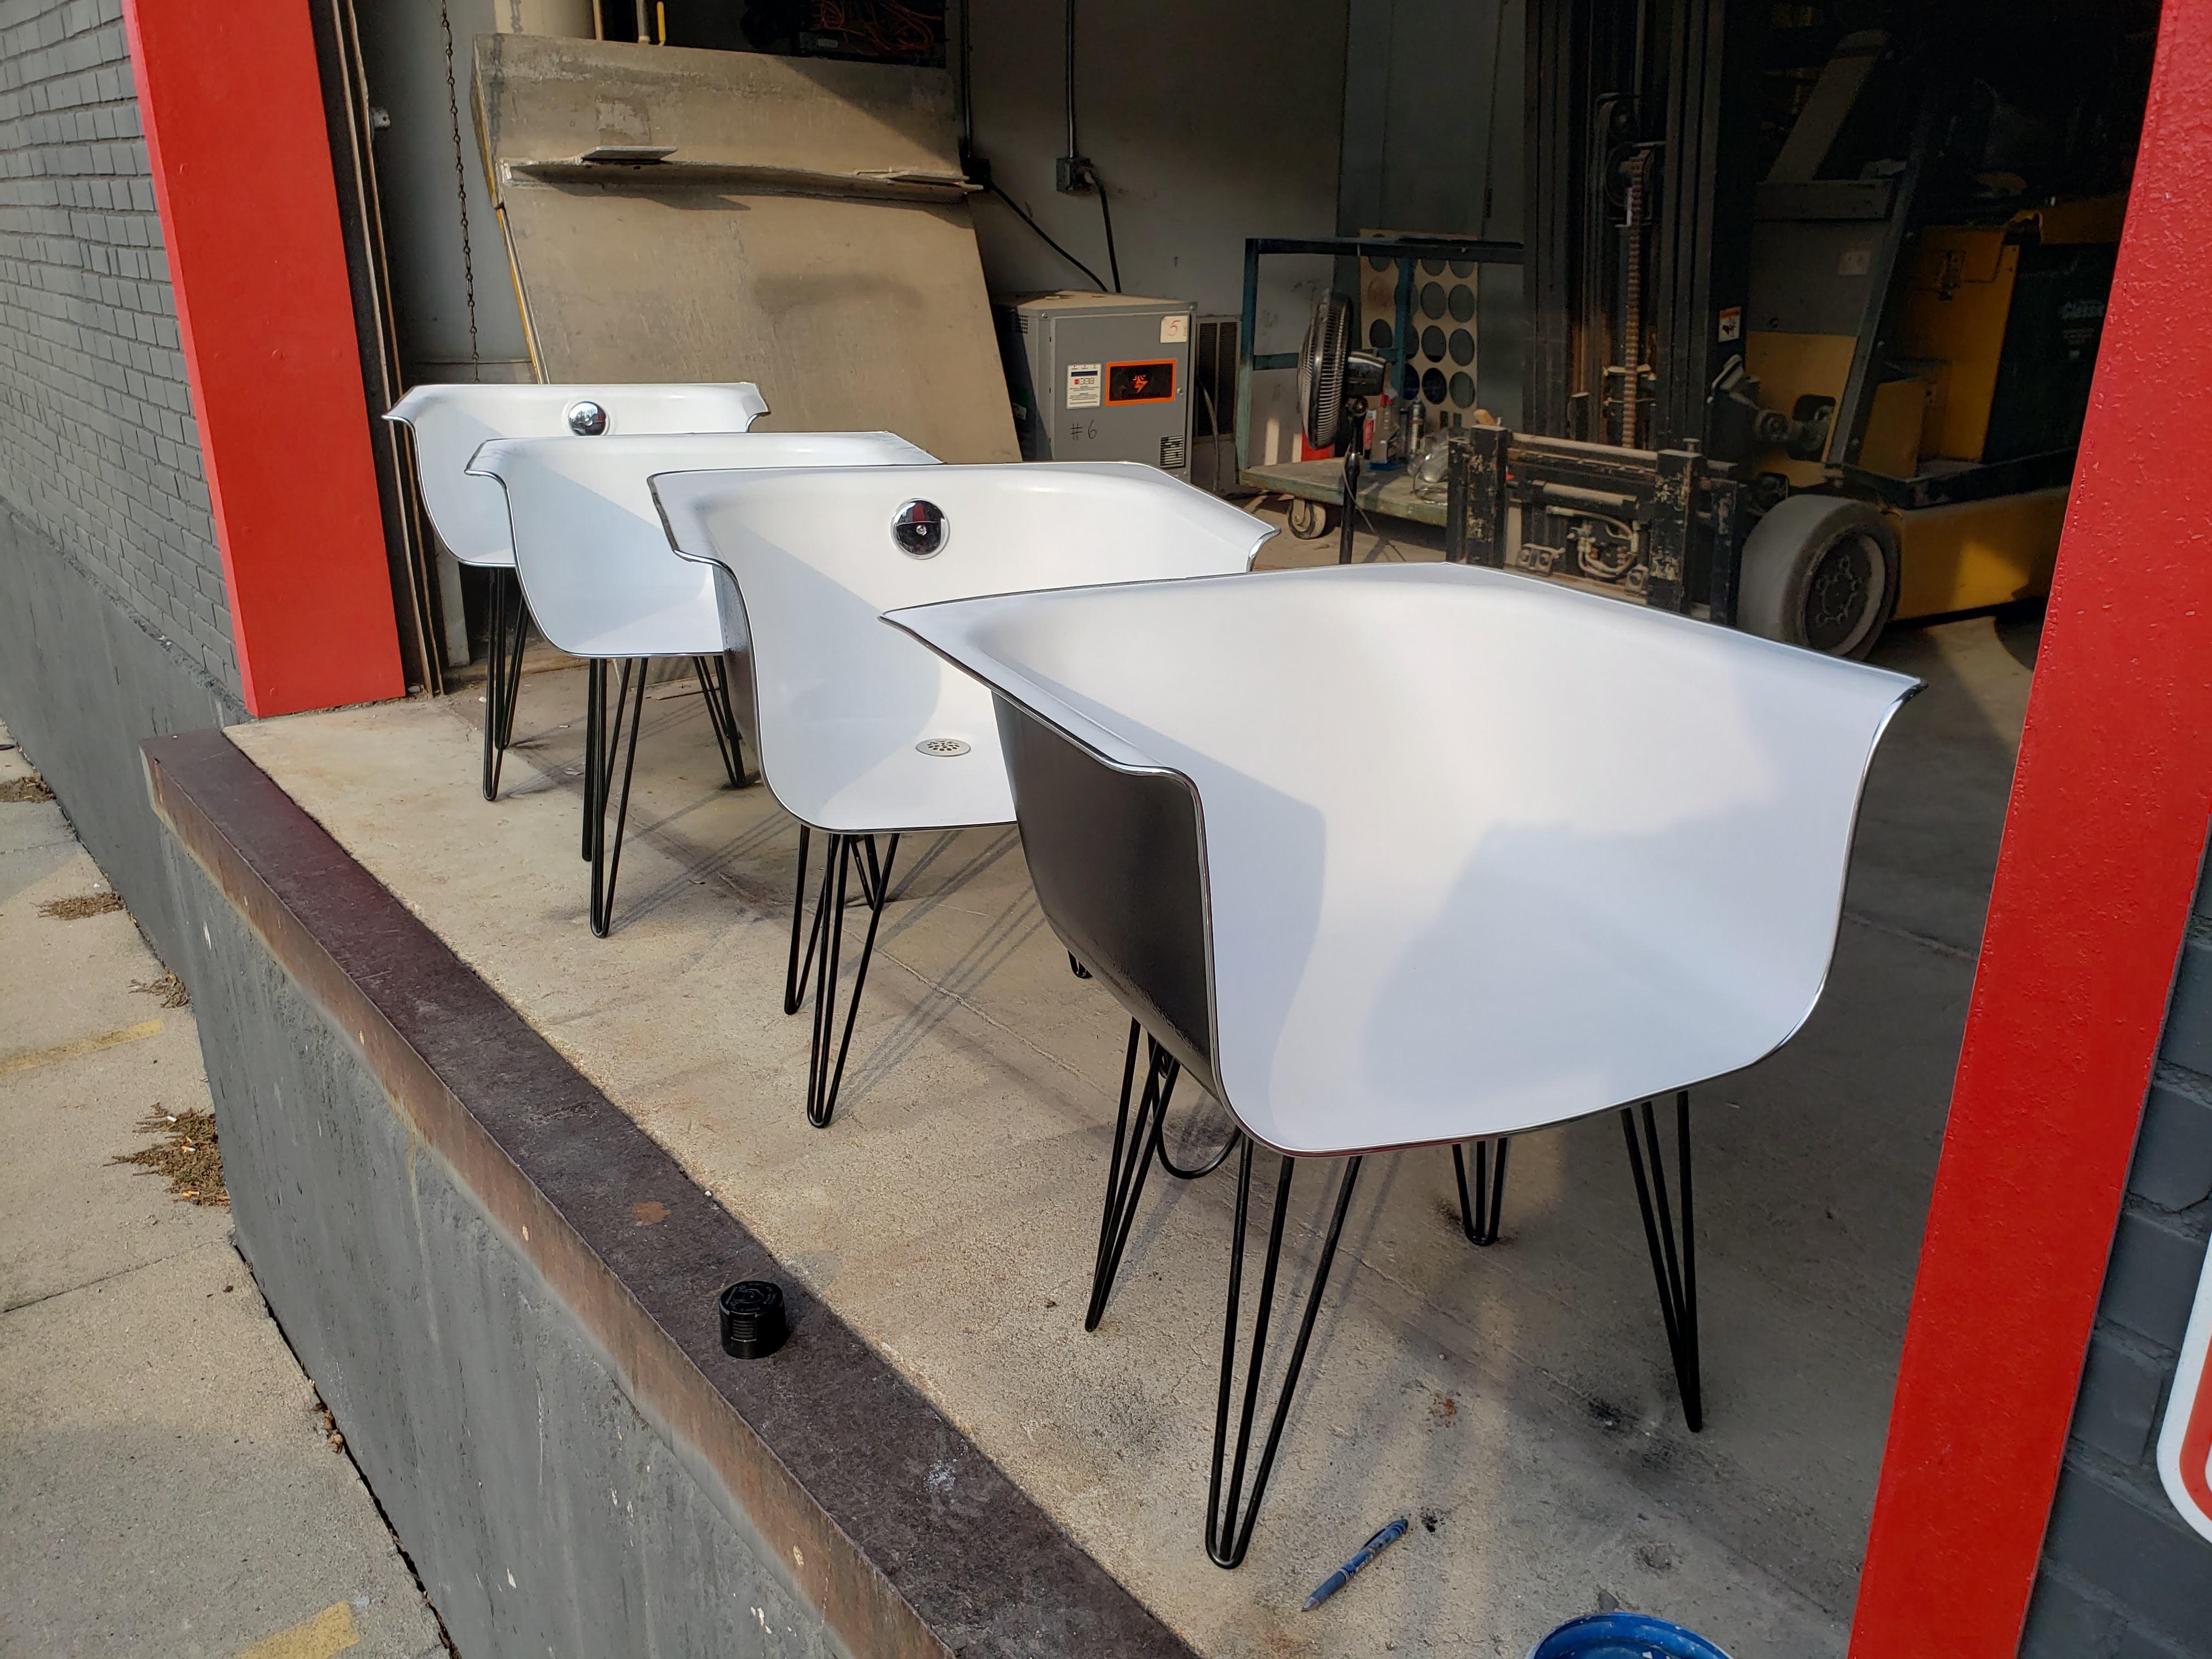 Bathtub chairs Taft Brewery